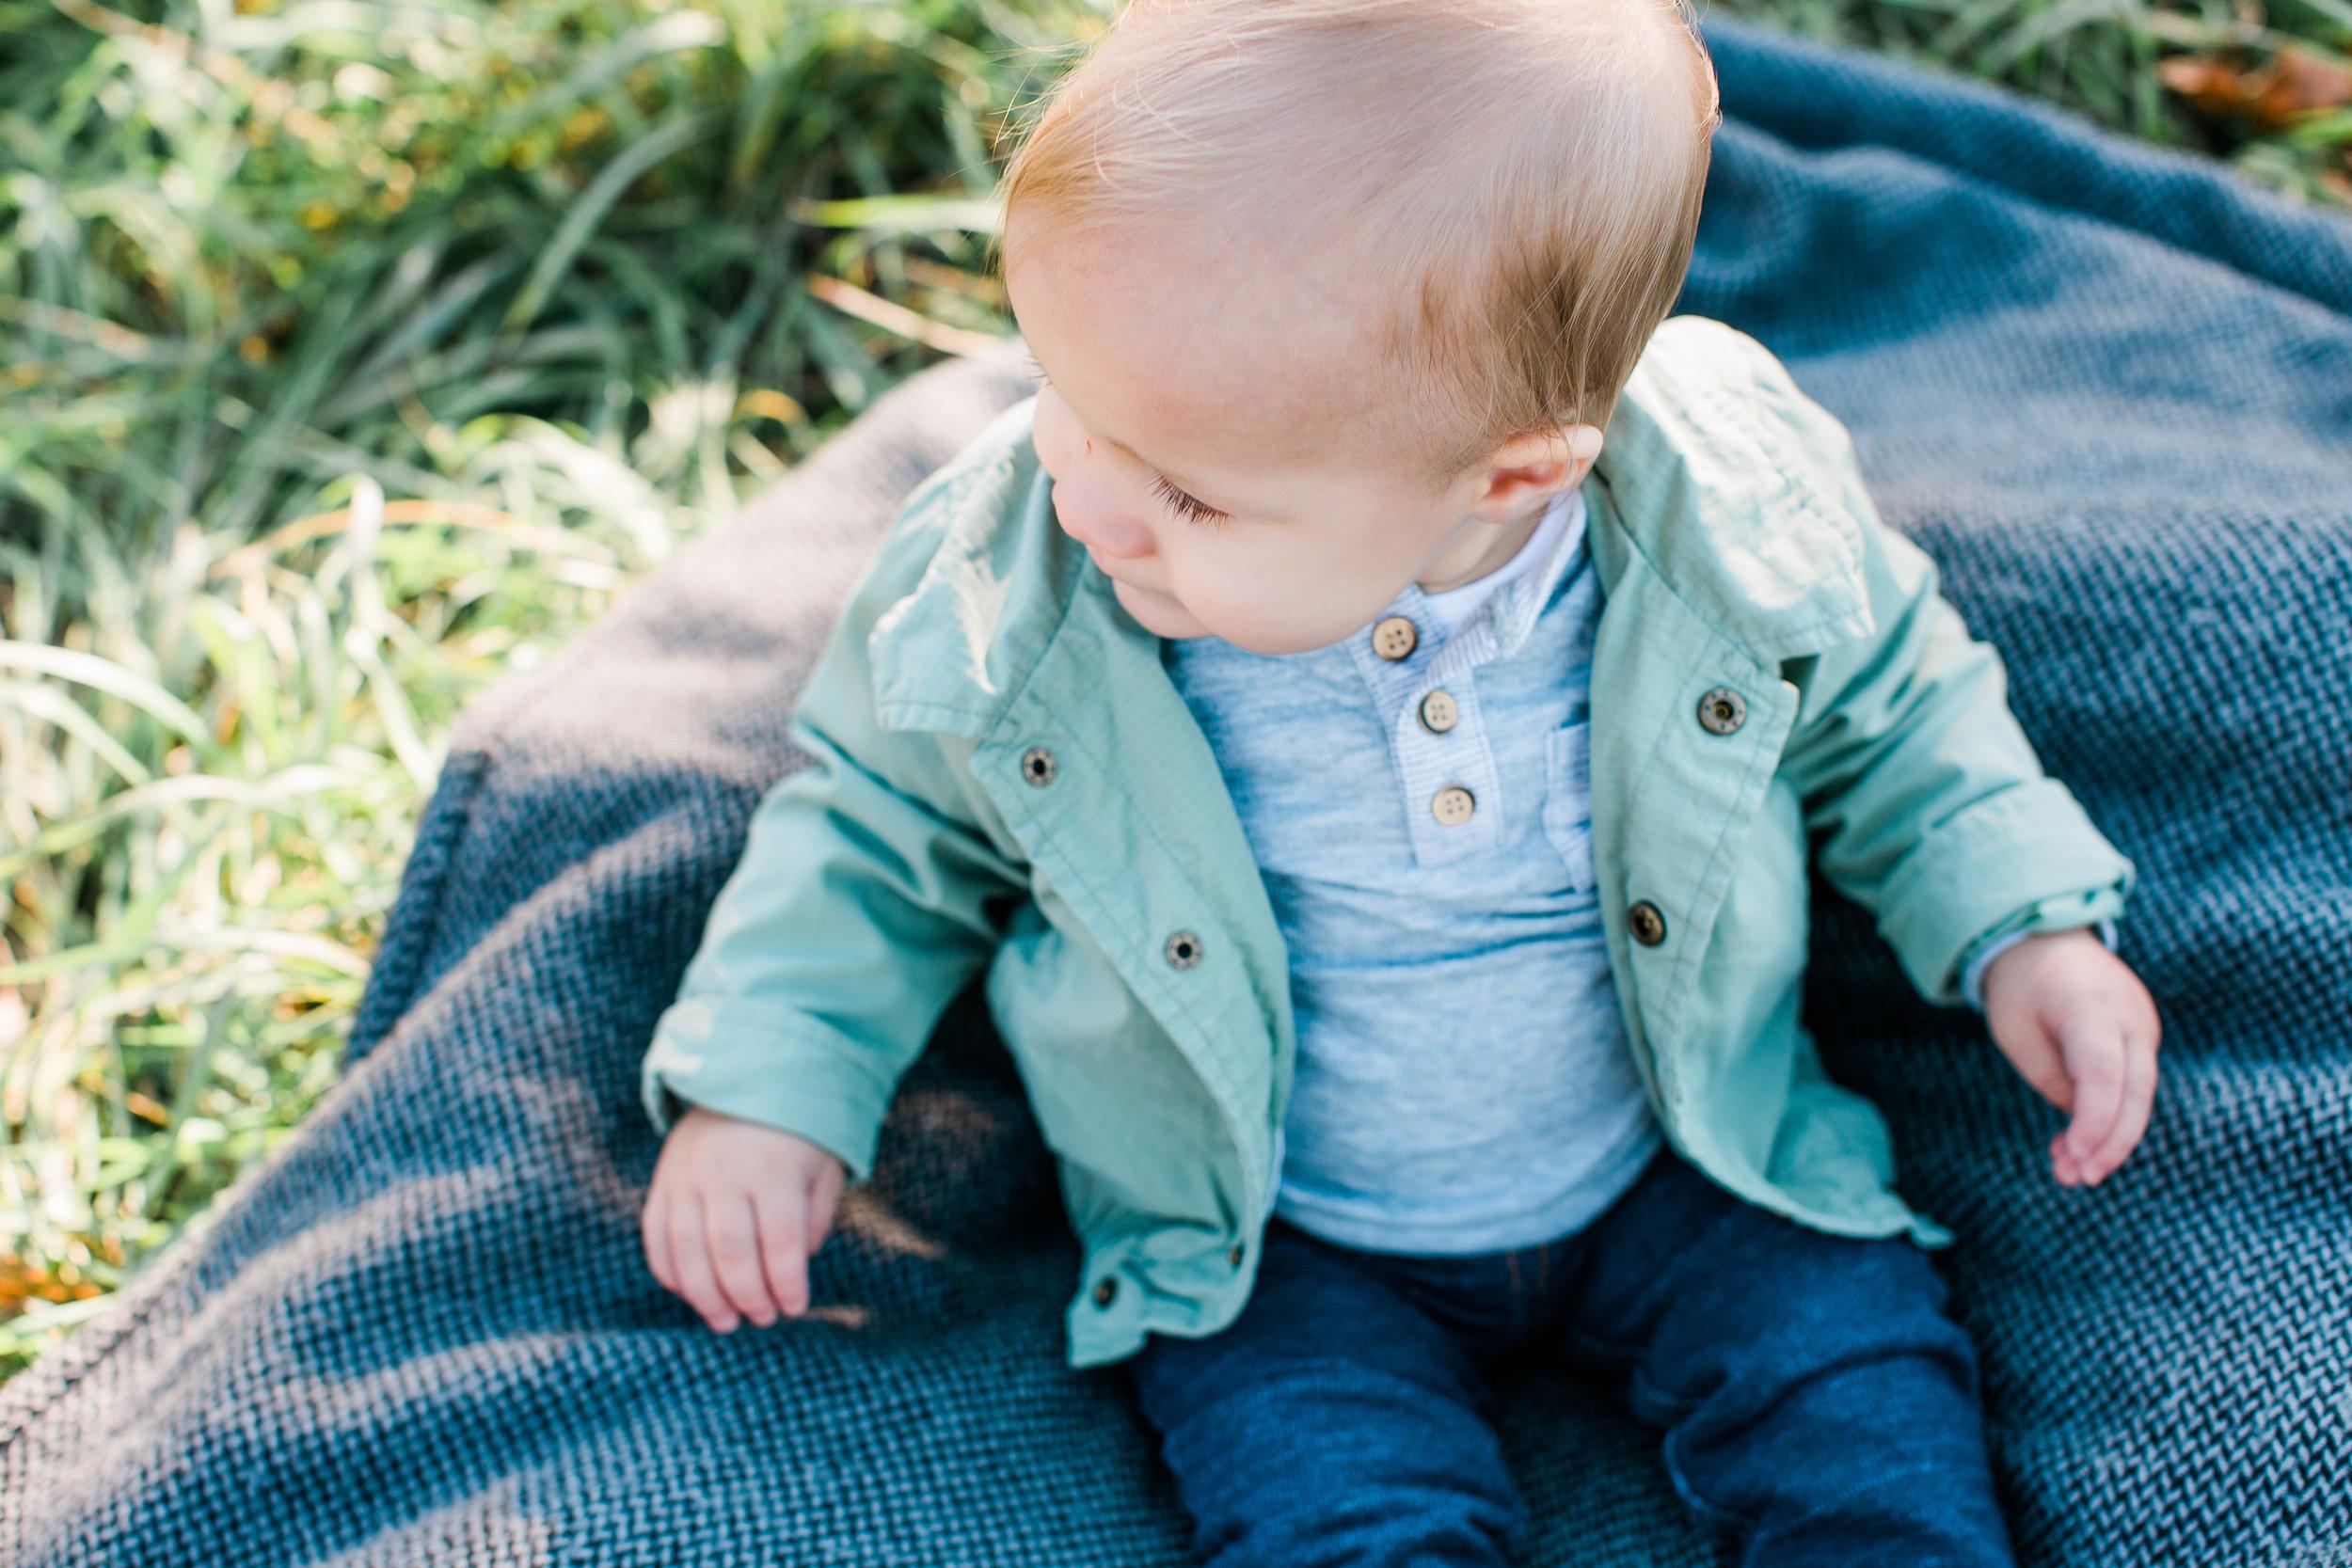 Blone baby boy portrait with green jacket jeans and long eyelashes Minnesota family photographer Mallory Kiesow Photography